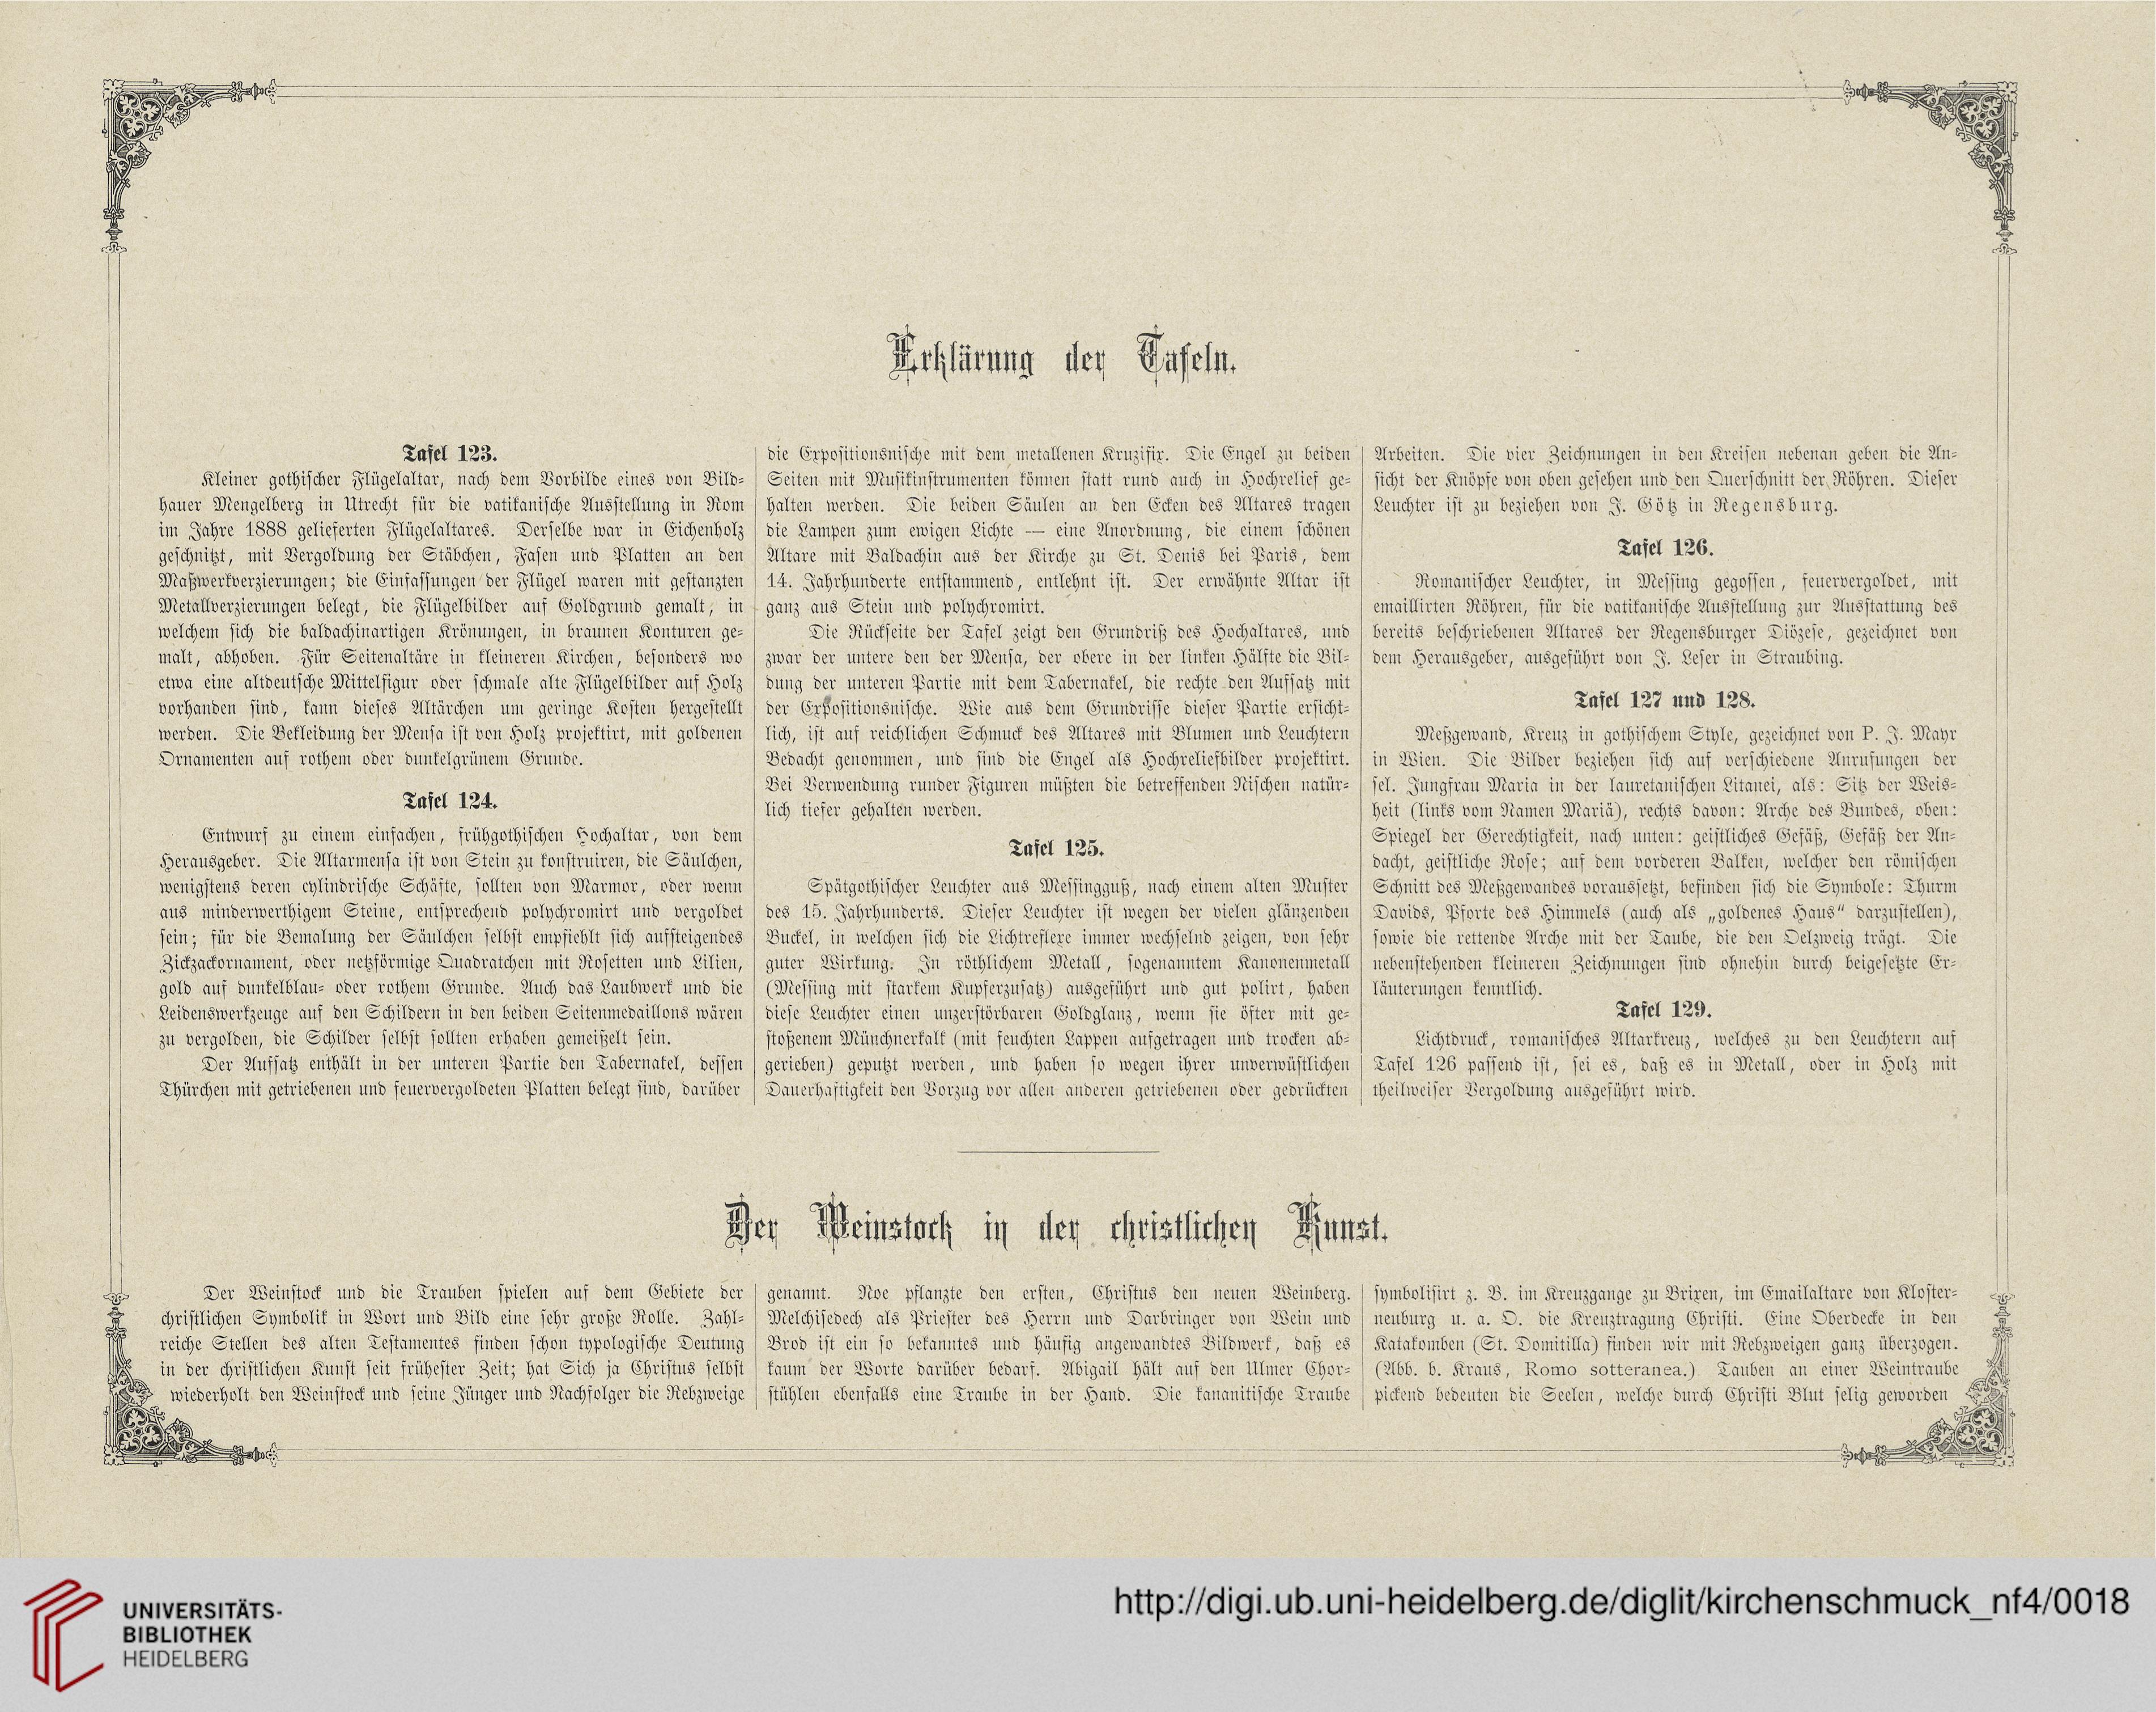 Großzügig Mbo Vorlage Galerie - Entry Level Resume Vorlagen Sammlung ...